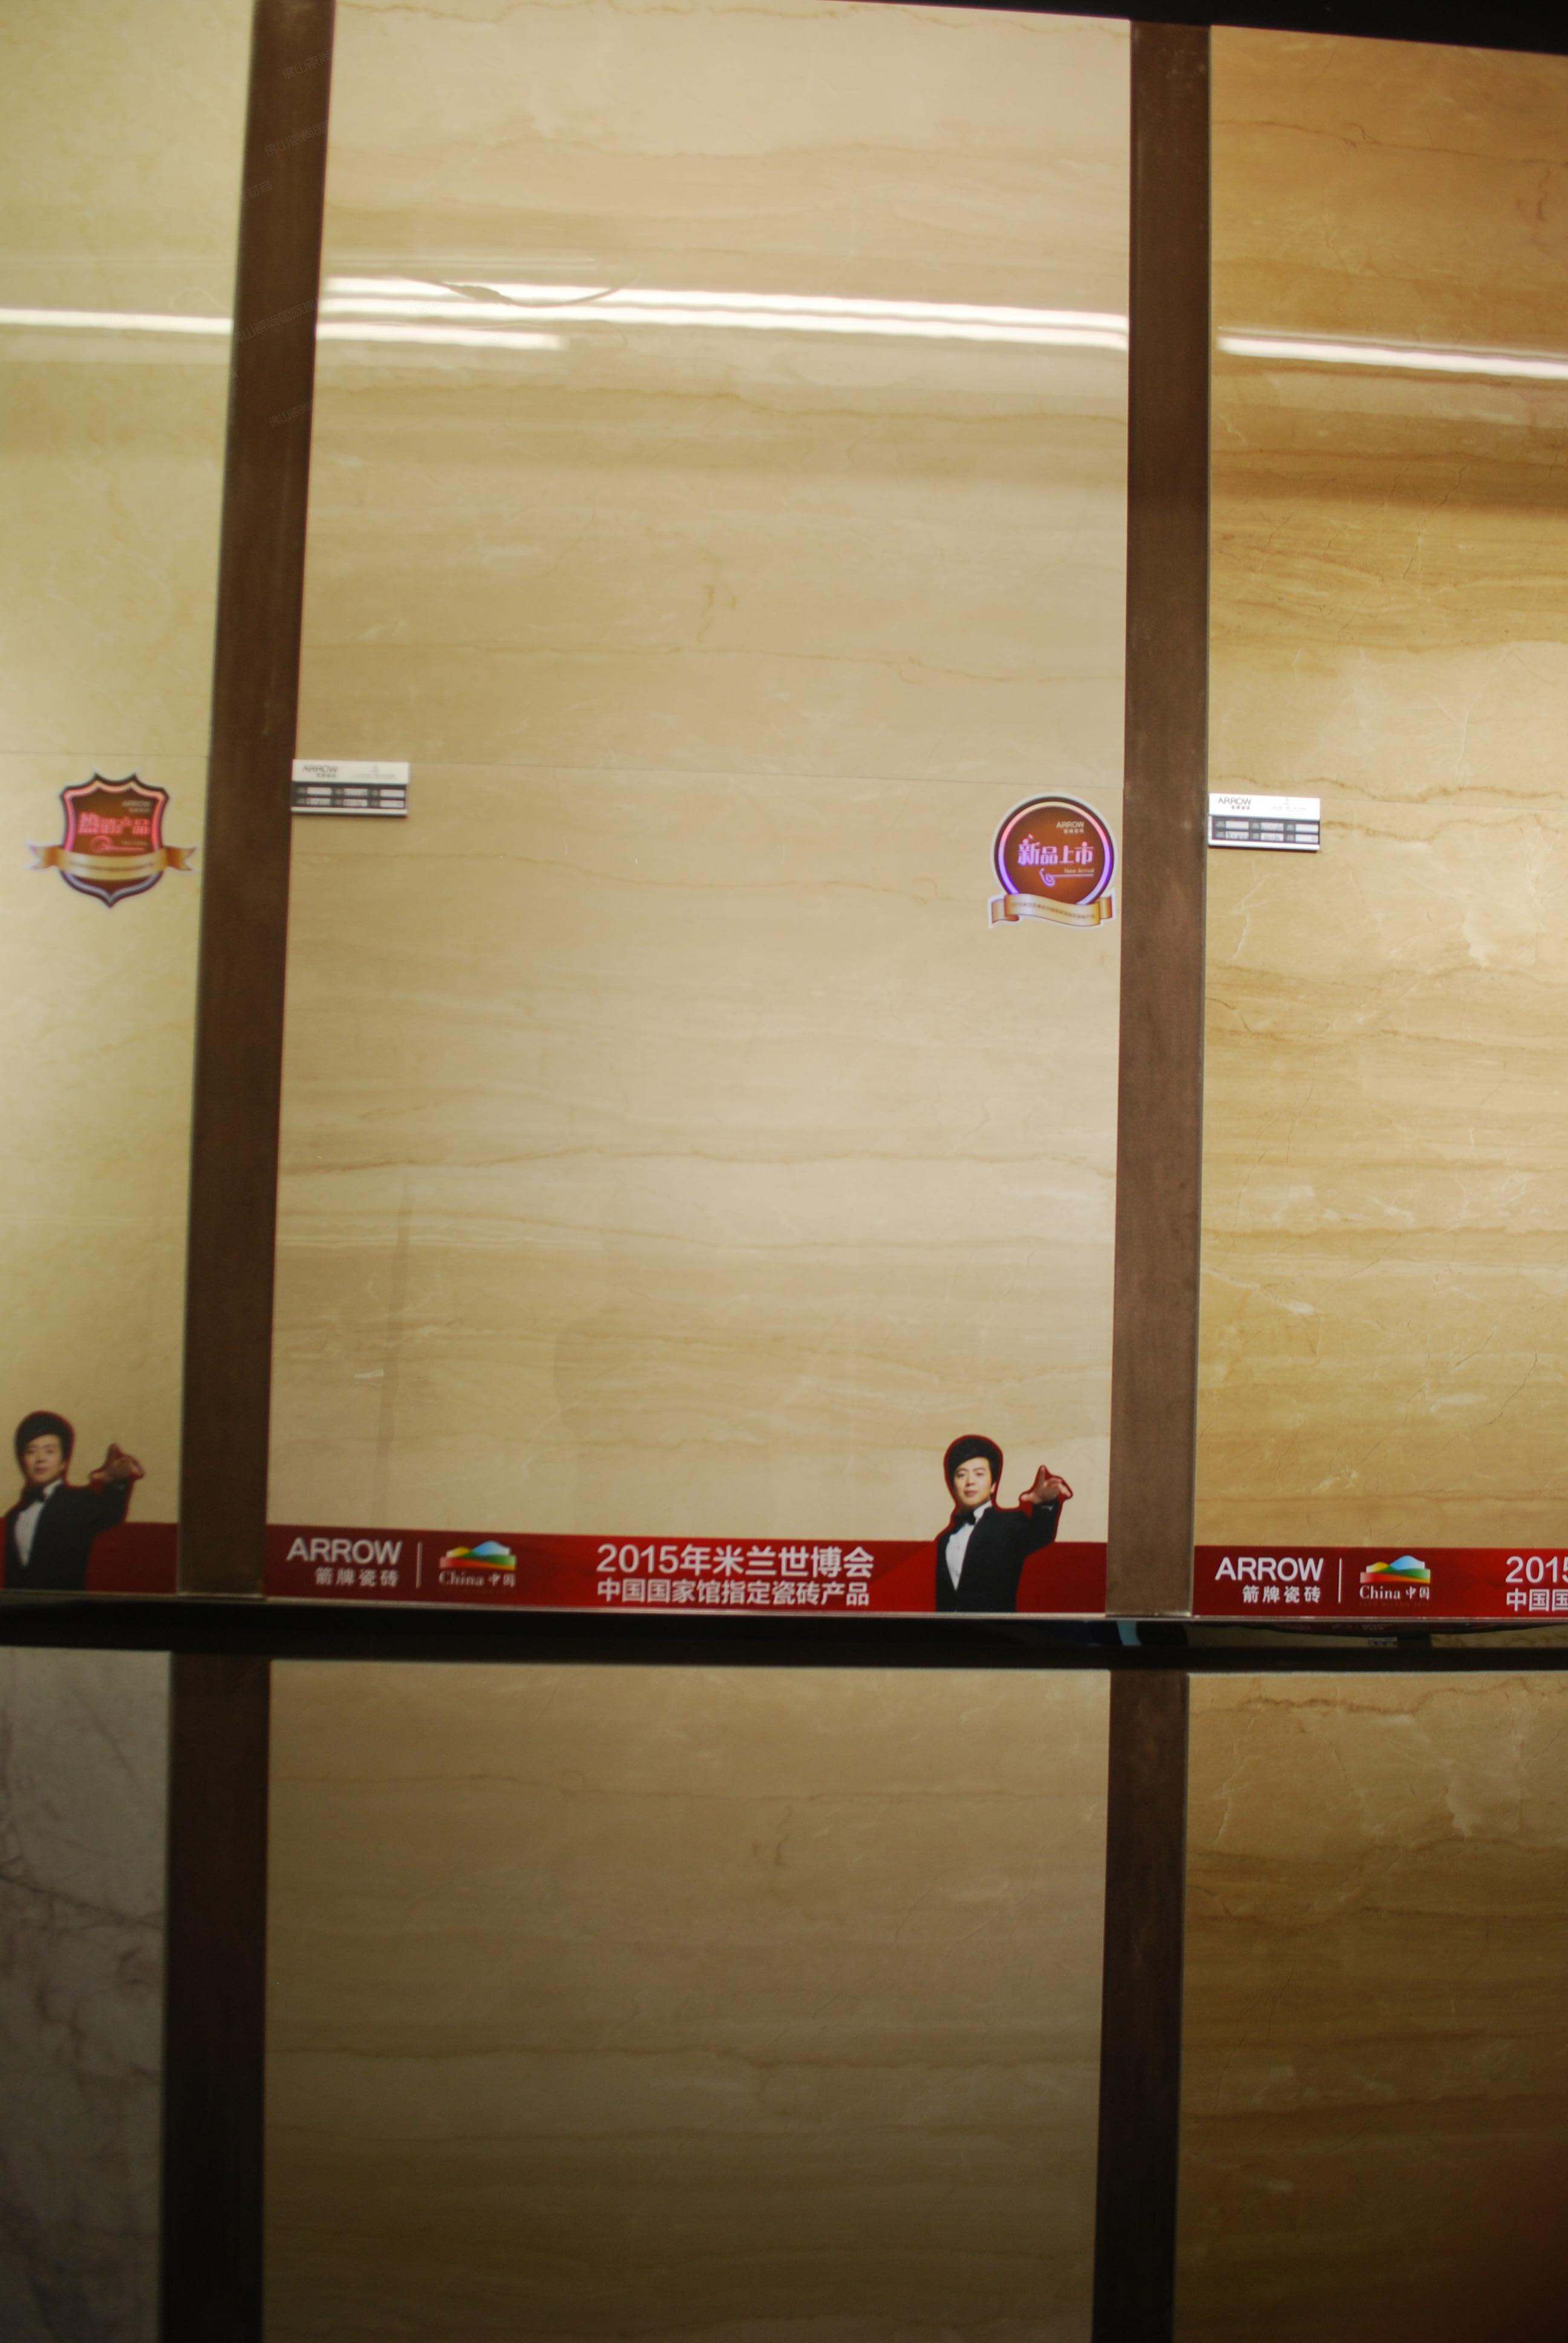 ARROW箭牌瓷砖 全抛釉 意大利木纹531/532 客厅厨卫墙地面砖